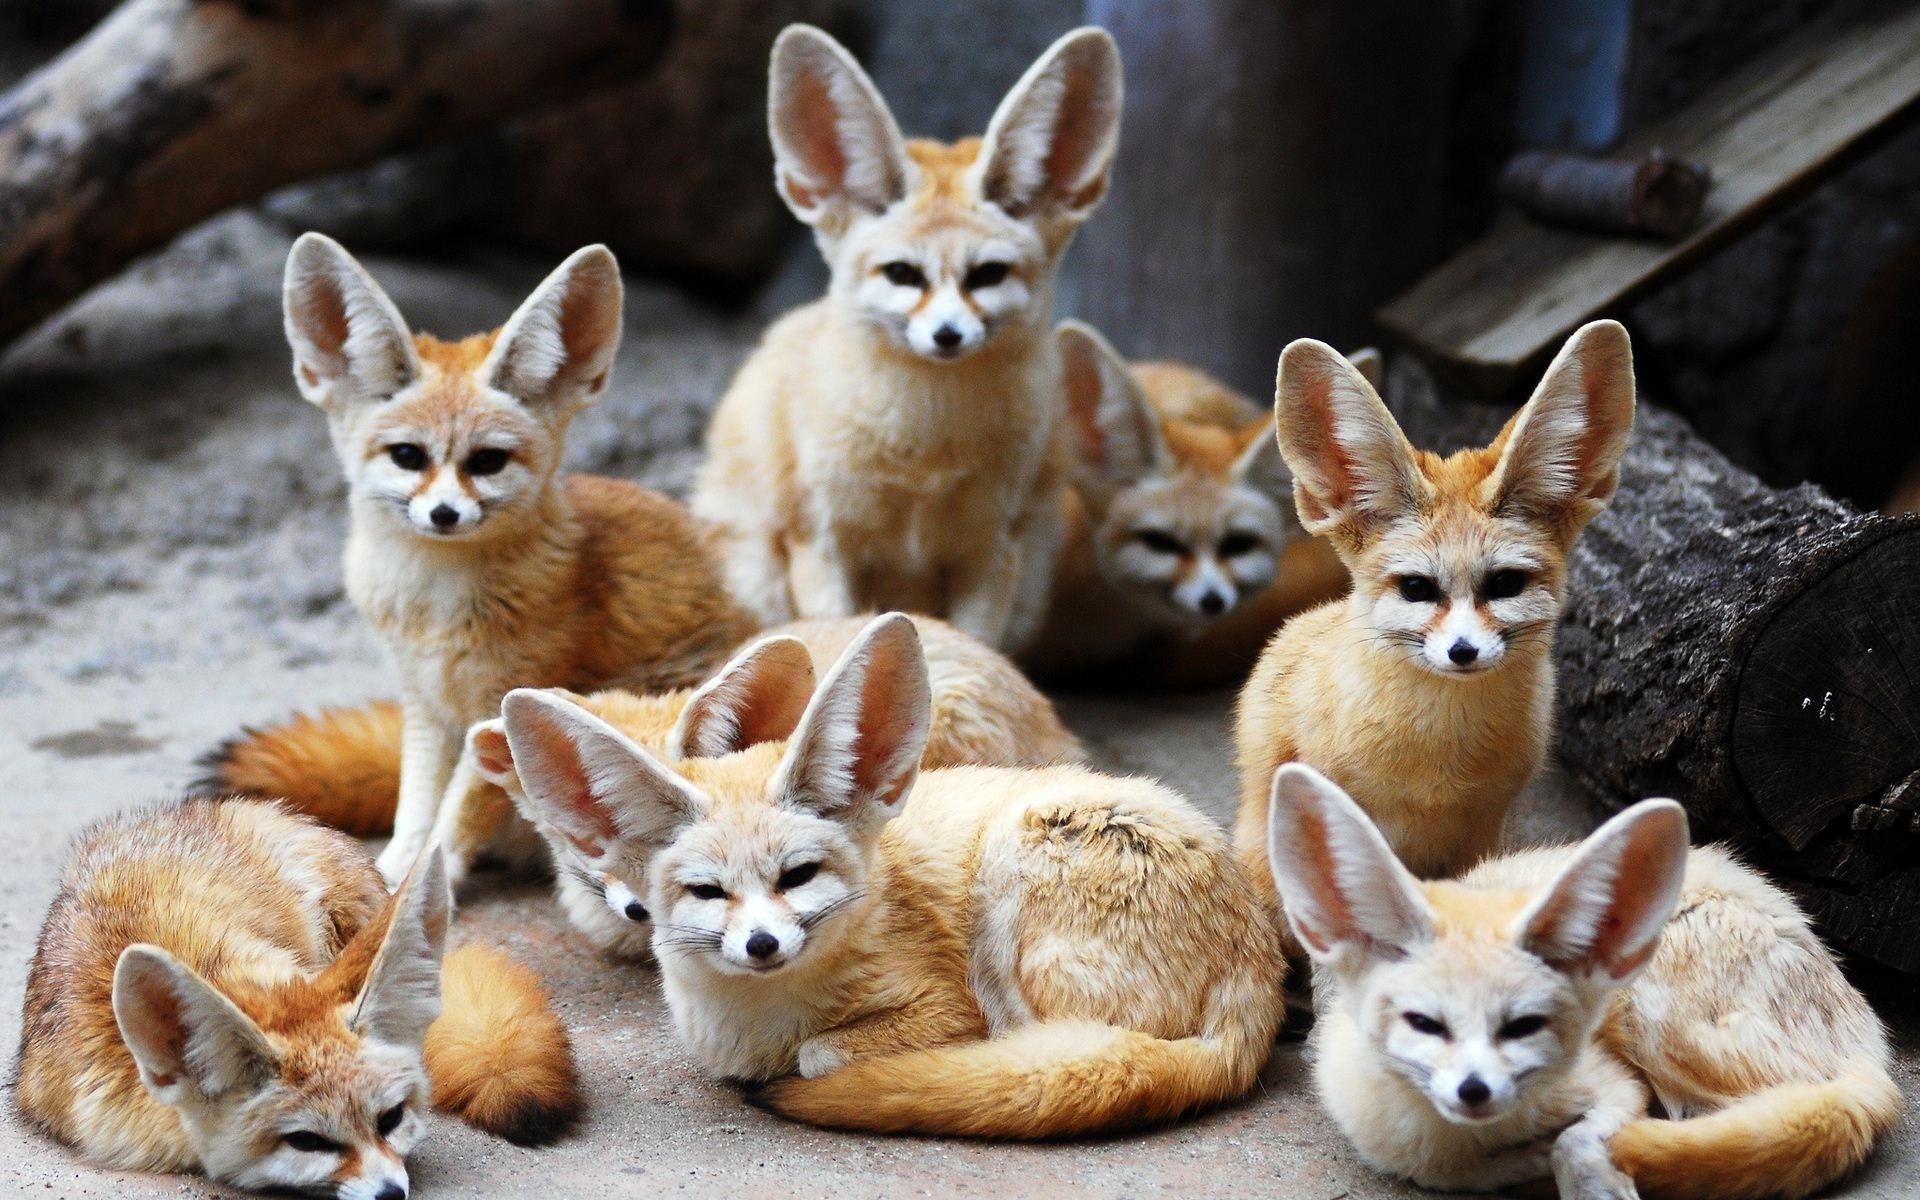 Animal · Cute fox animal in winter season | HD Wallpapers Rocks